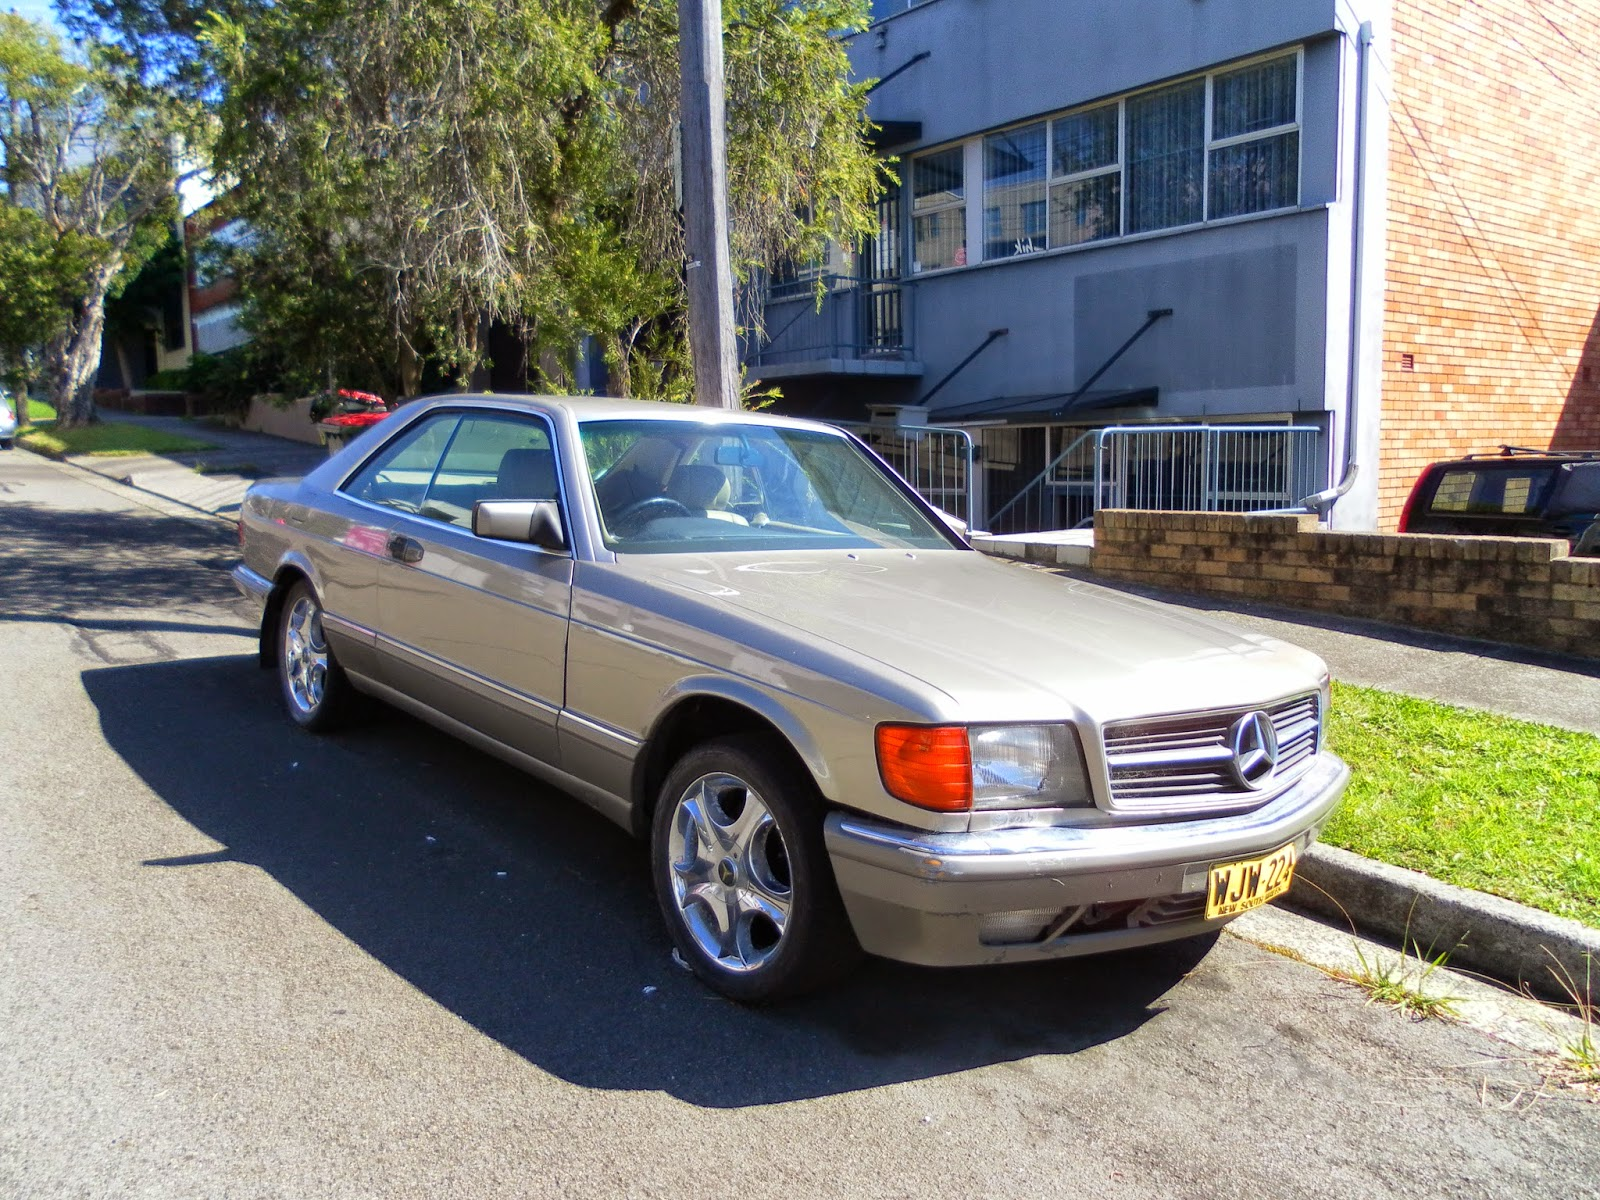 aussie old parked cars 1984 mercedes benz w126 500 sec. Black Bedroom Furniture Sets. Home Design Ideas